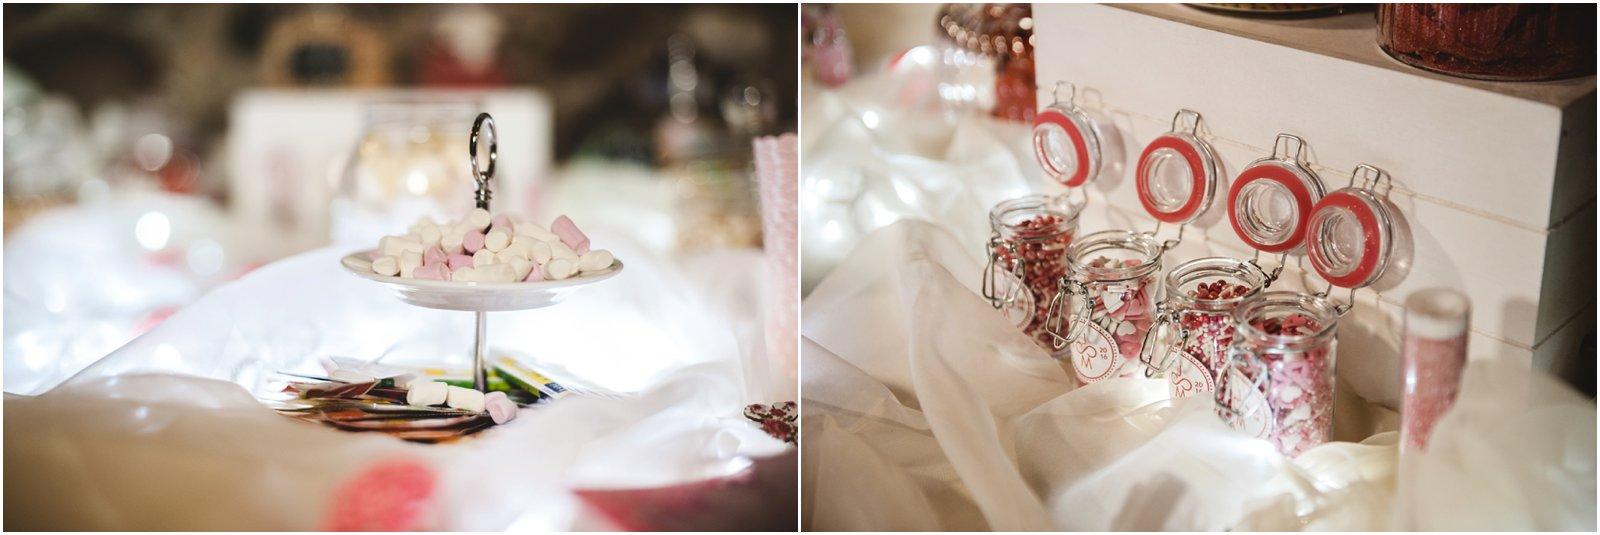 wedding planner verona_0046